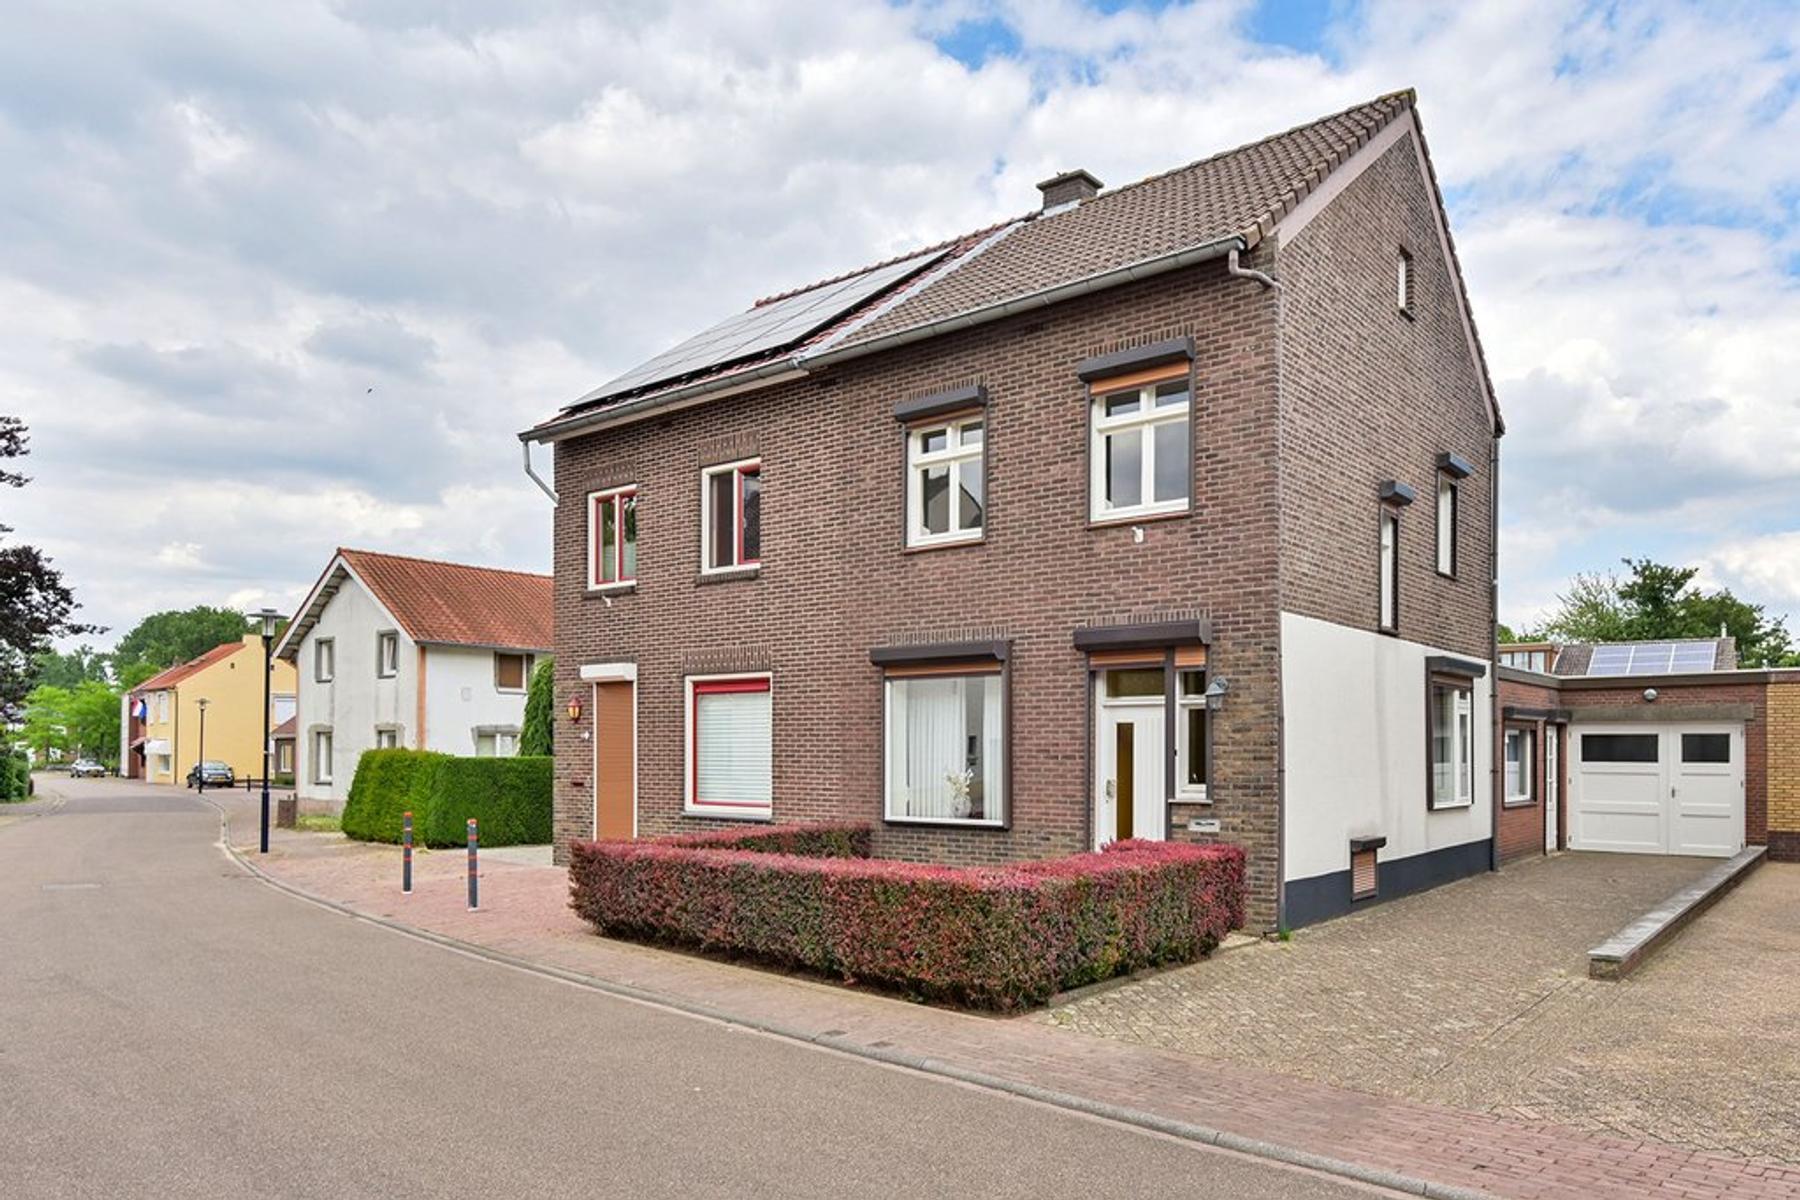 Maasstraat 23 in Obbicht 6125 AR